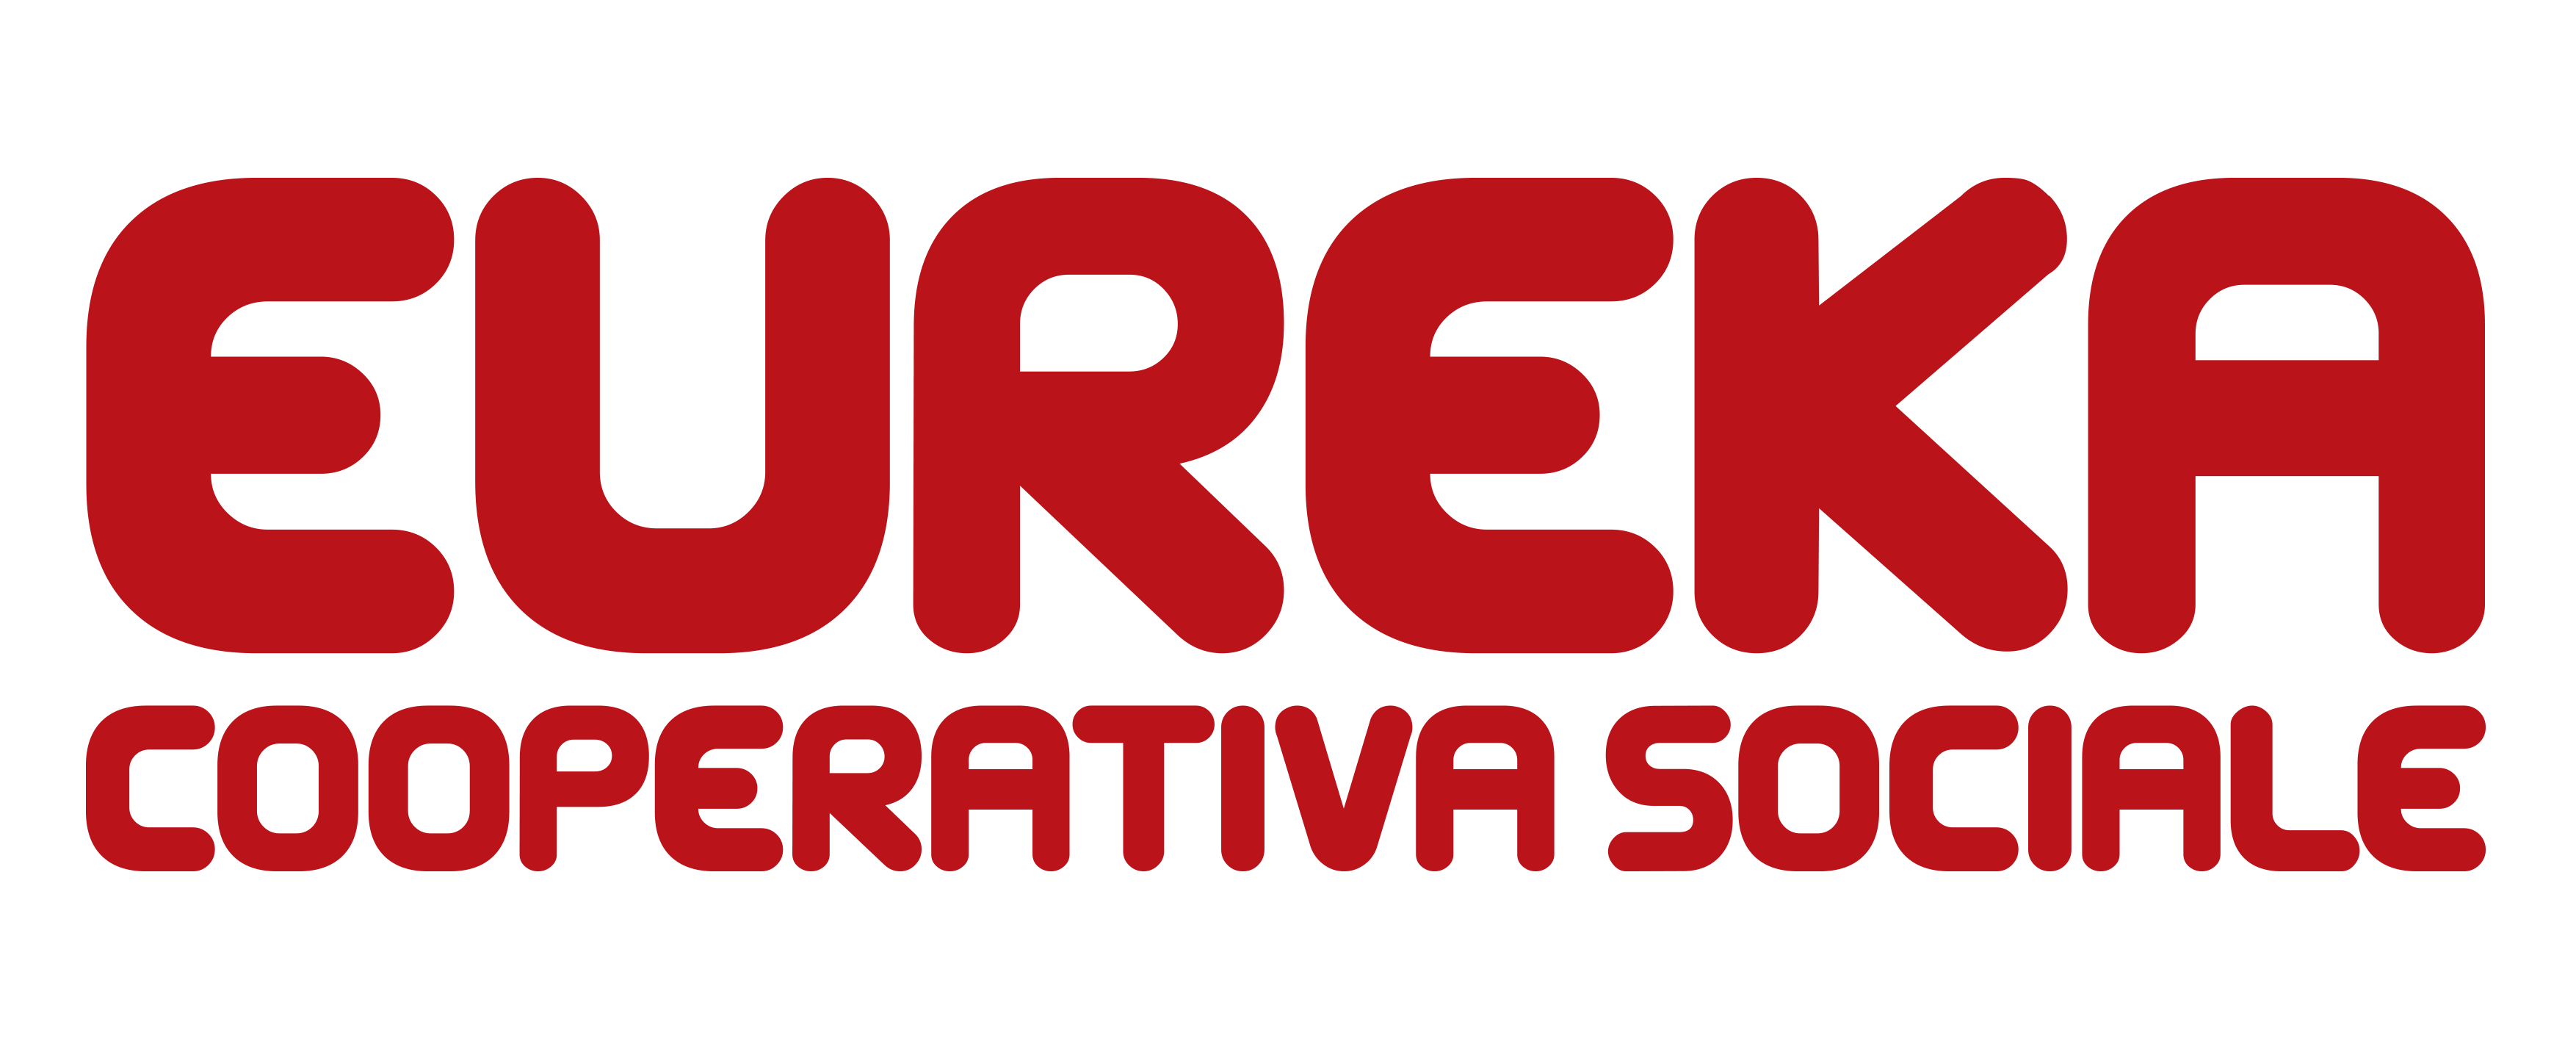 Eureka società cooperativa sociale